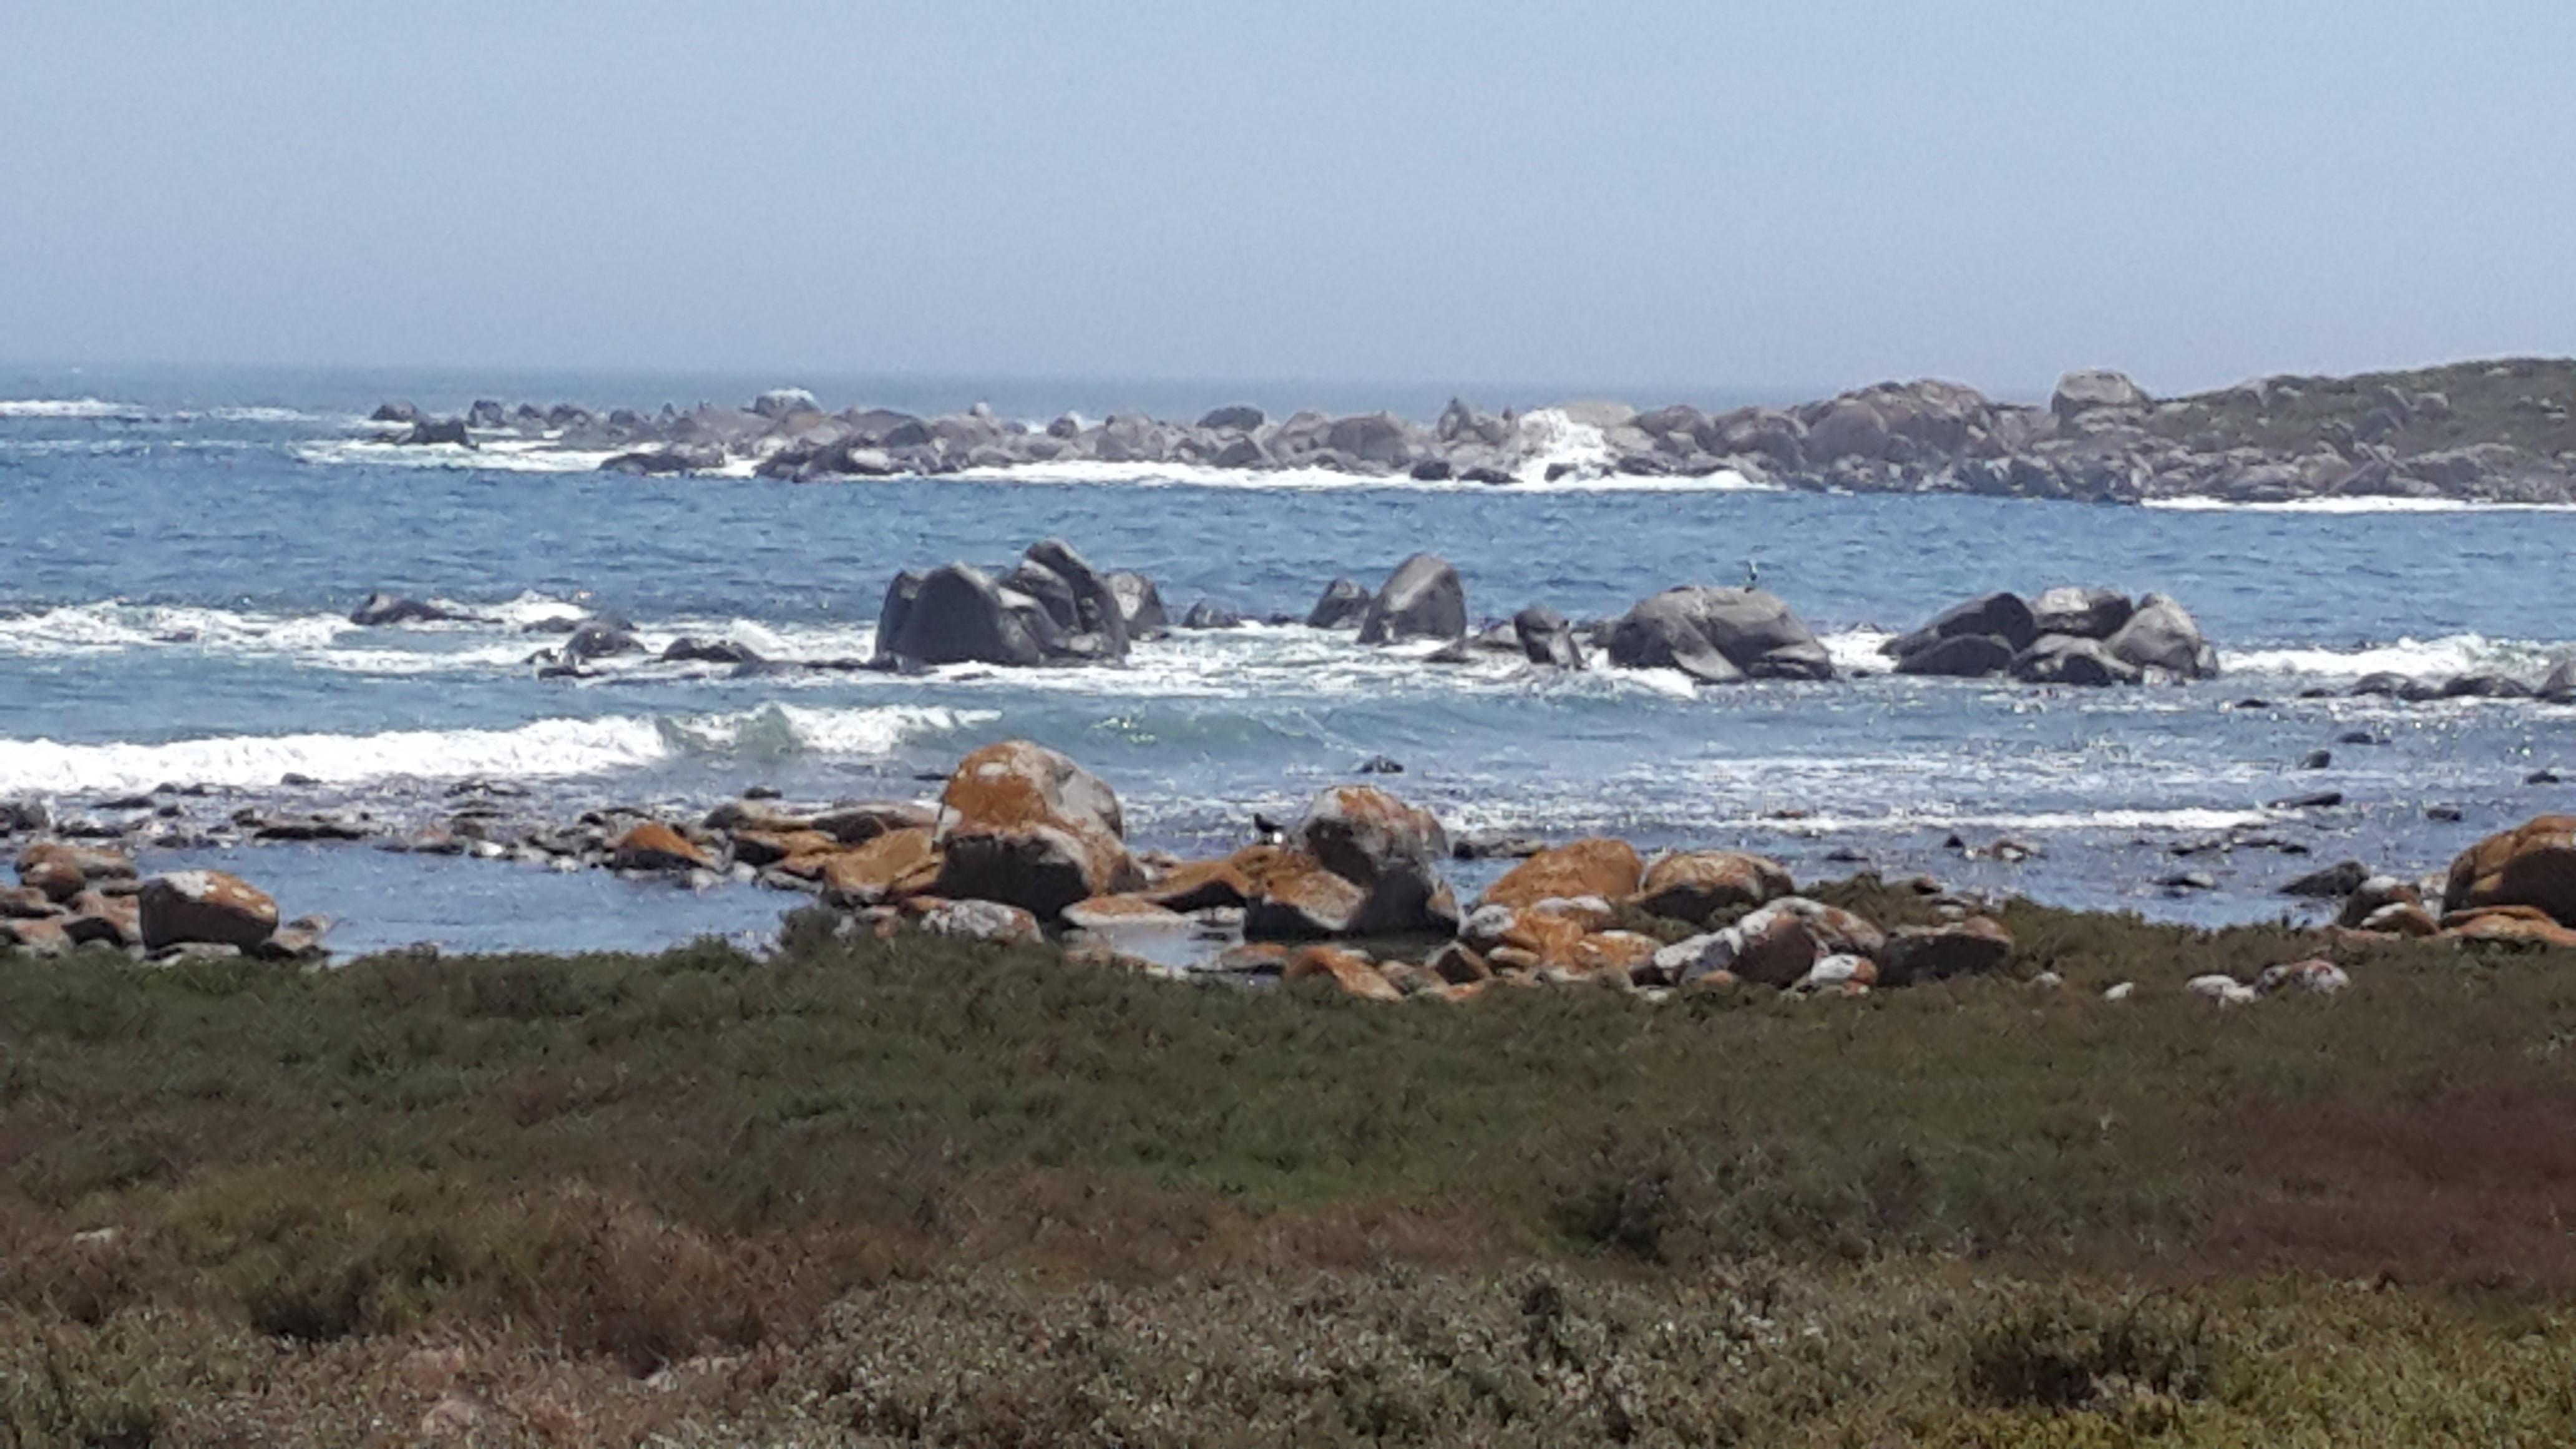 002 Atlantic Ocean